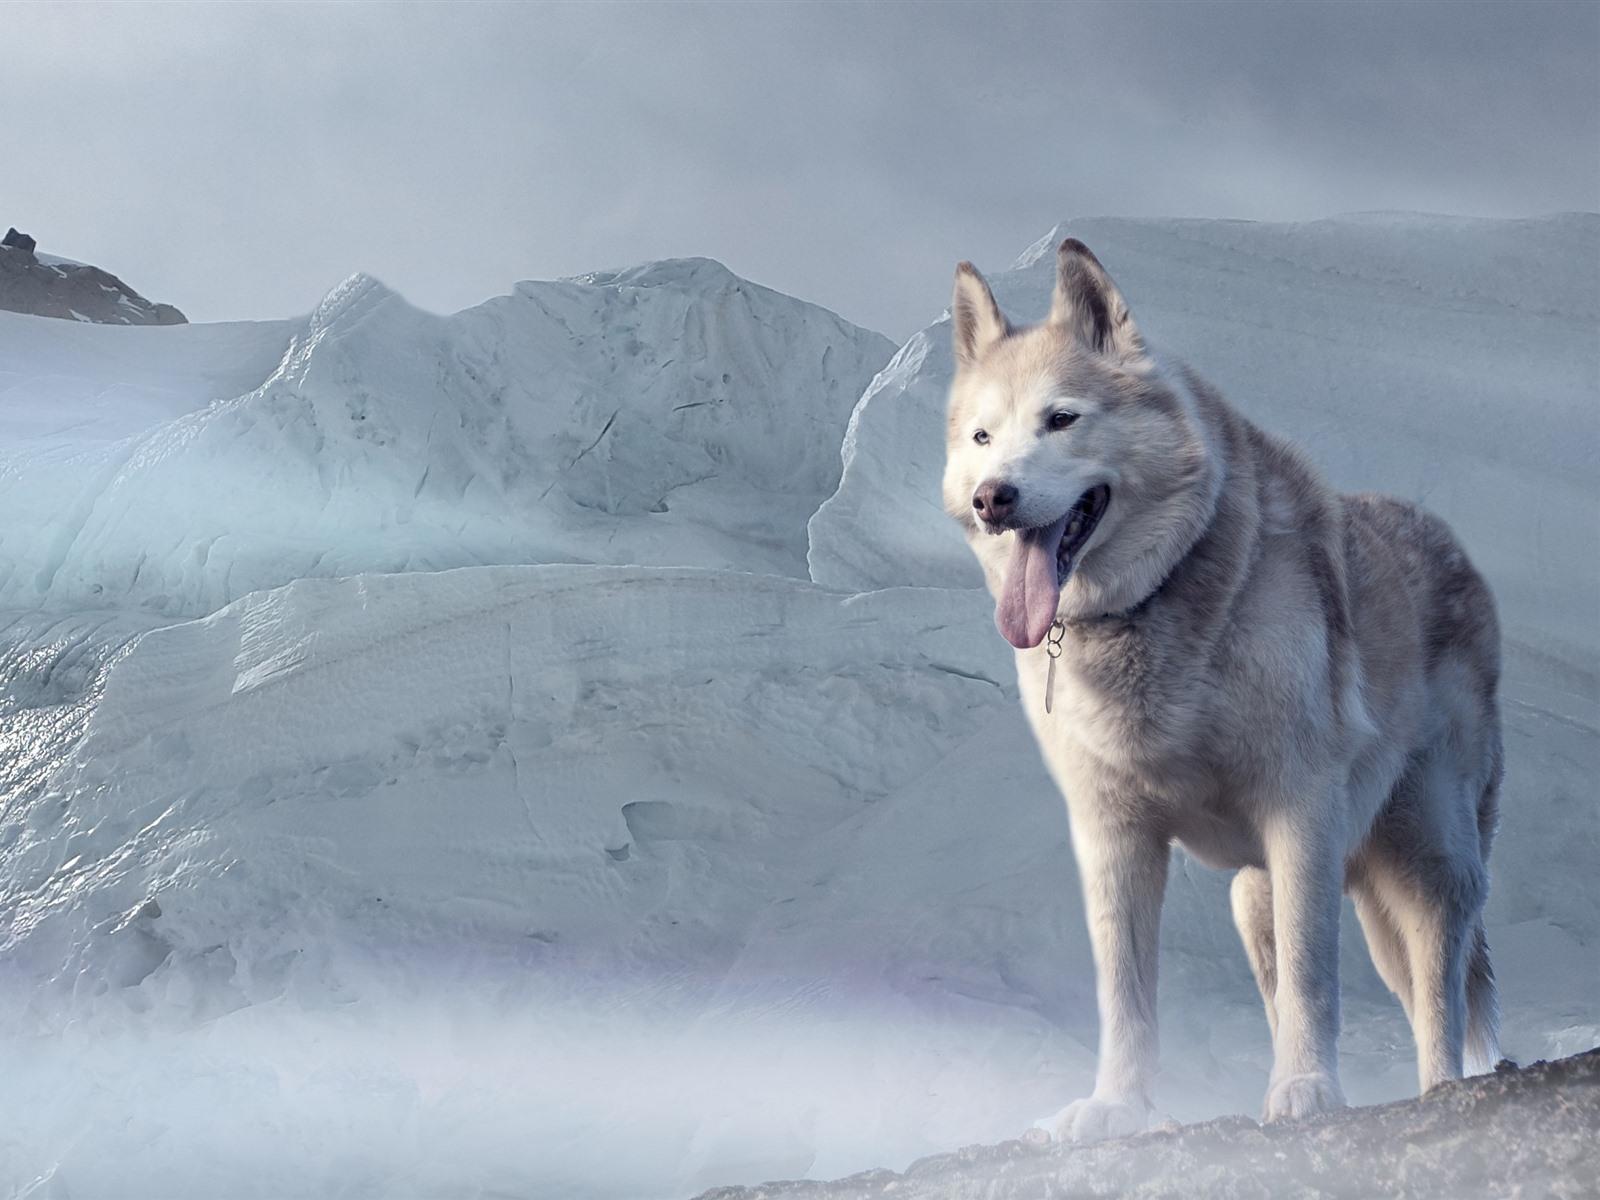 Perros Husky Siberiano Fondos De Pantalla Hd De Animales 2: Fondos De Pantalla Perro Husky Glaciar 2880x1800 HD Imagen